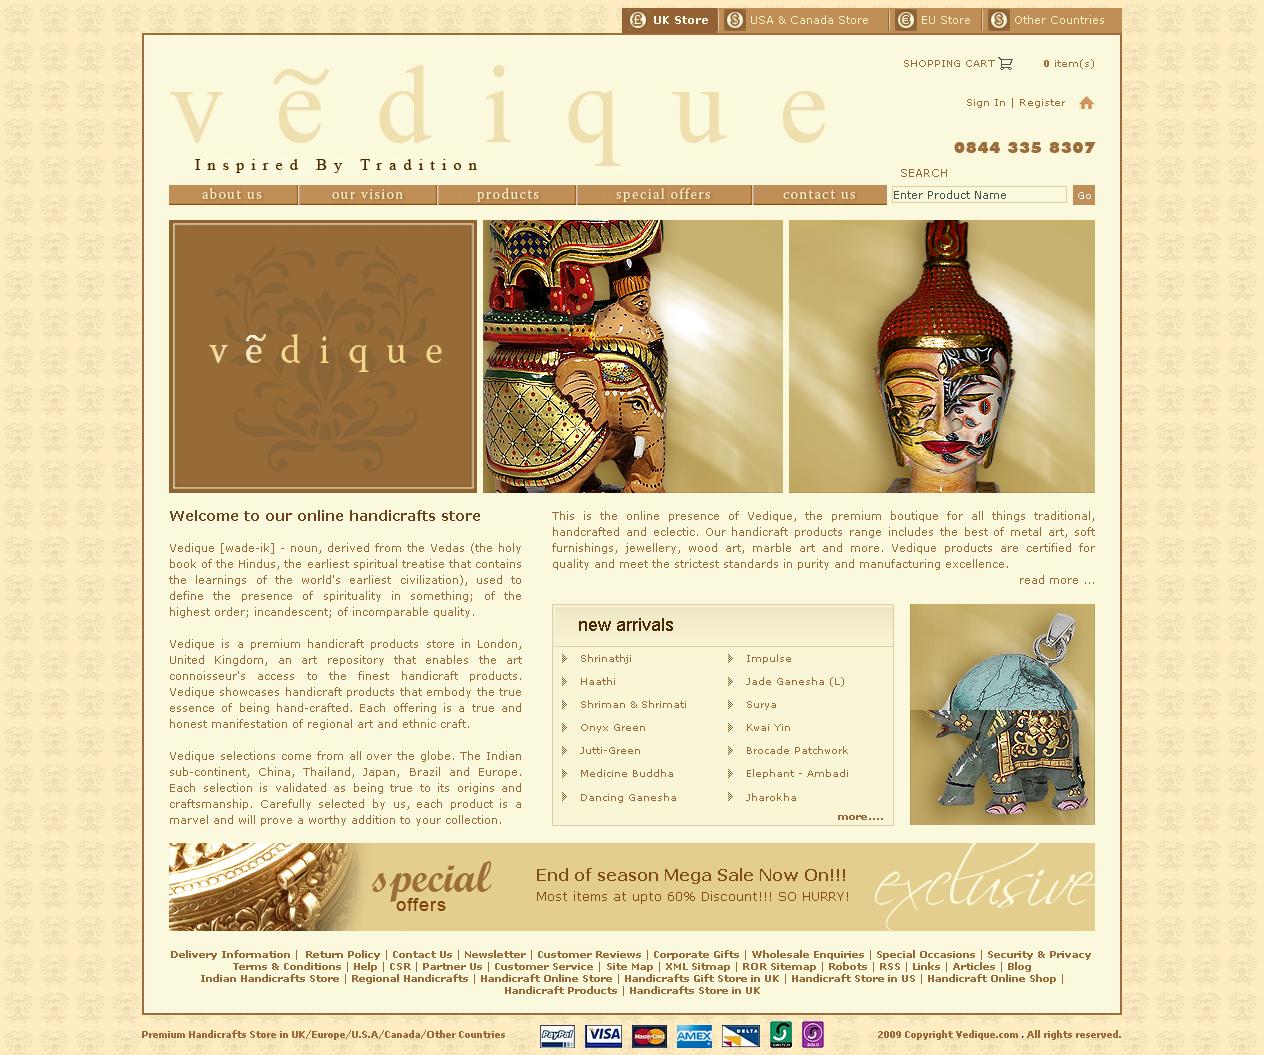 vedique iknoor technology pvt ltd itpl